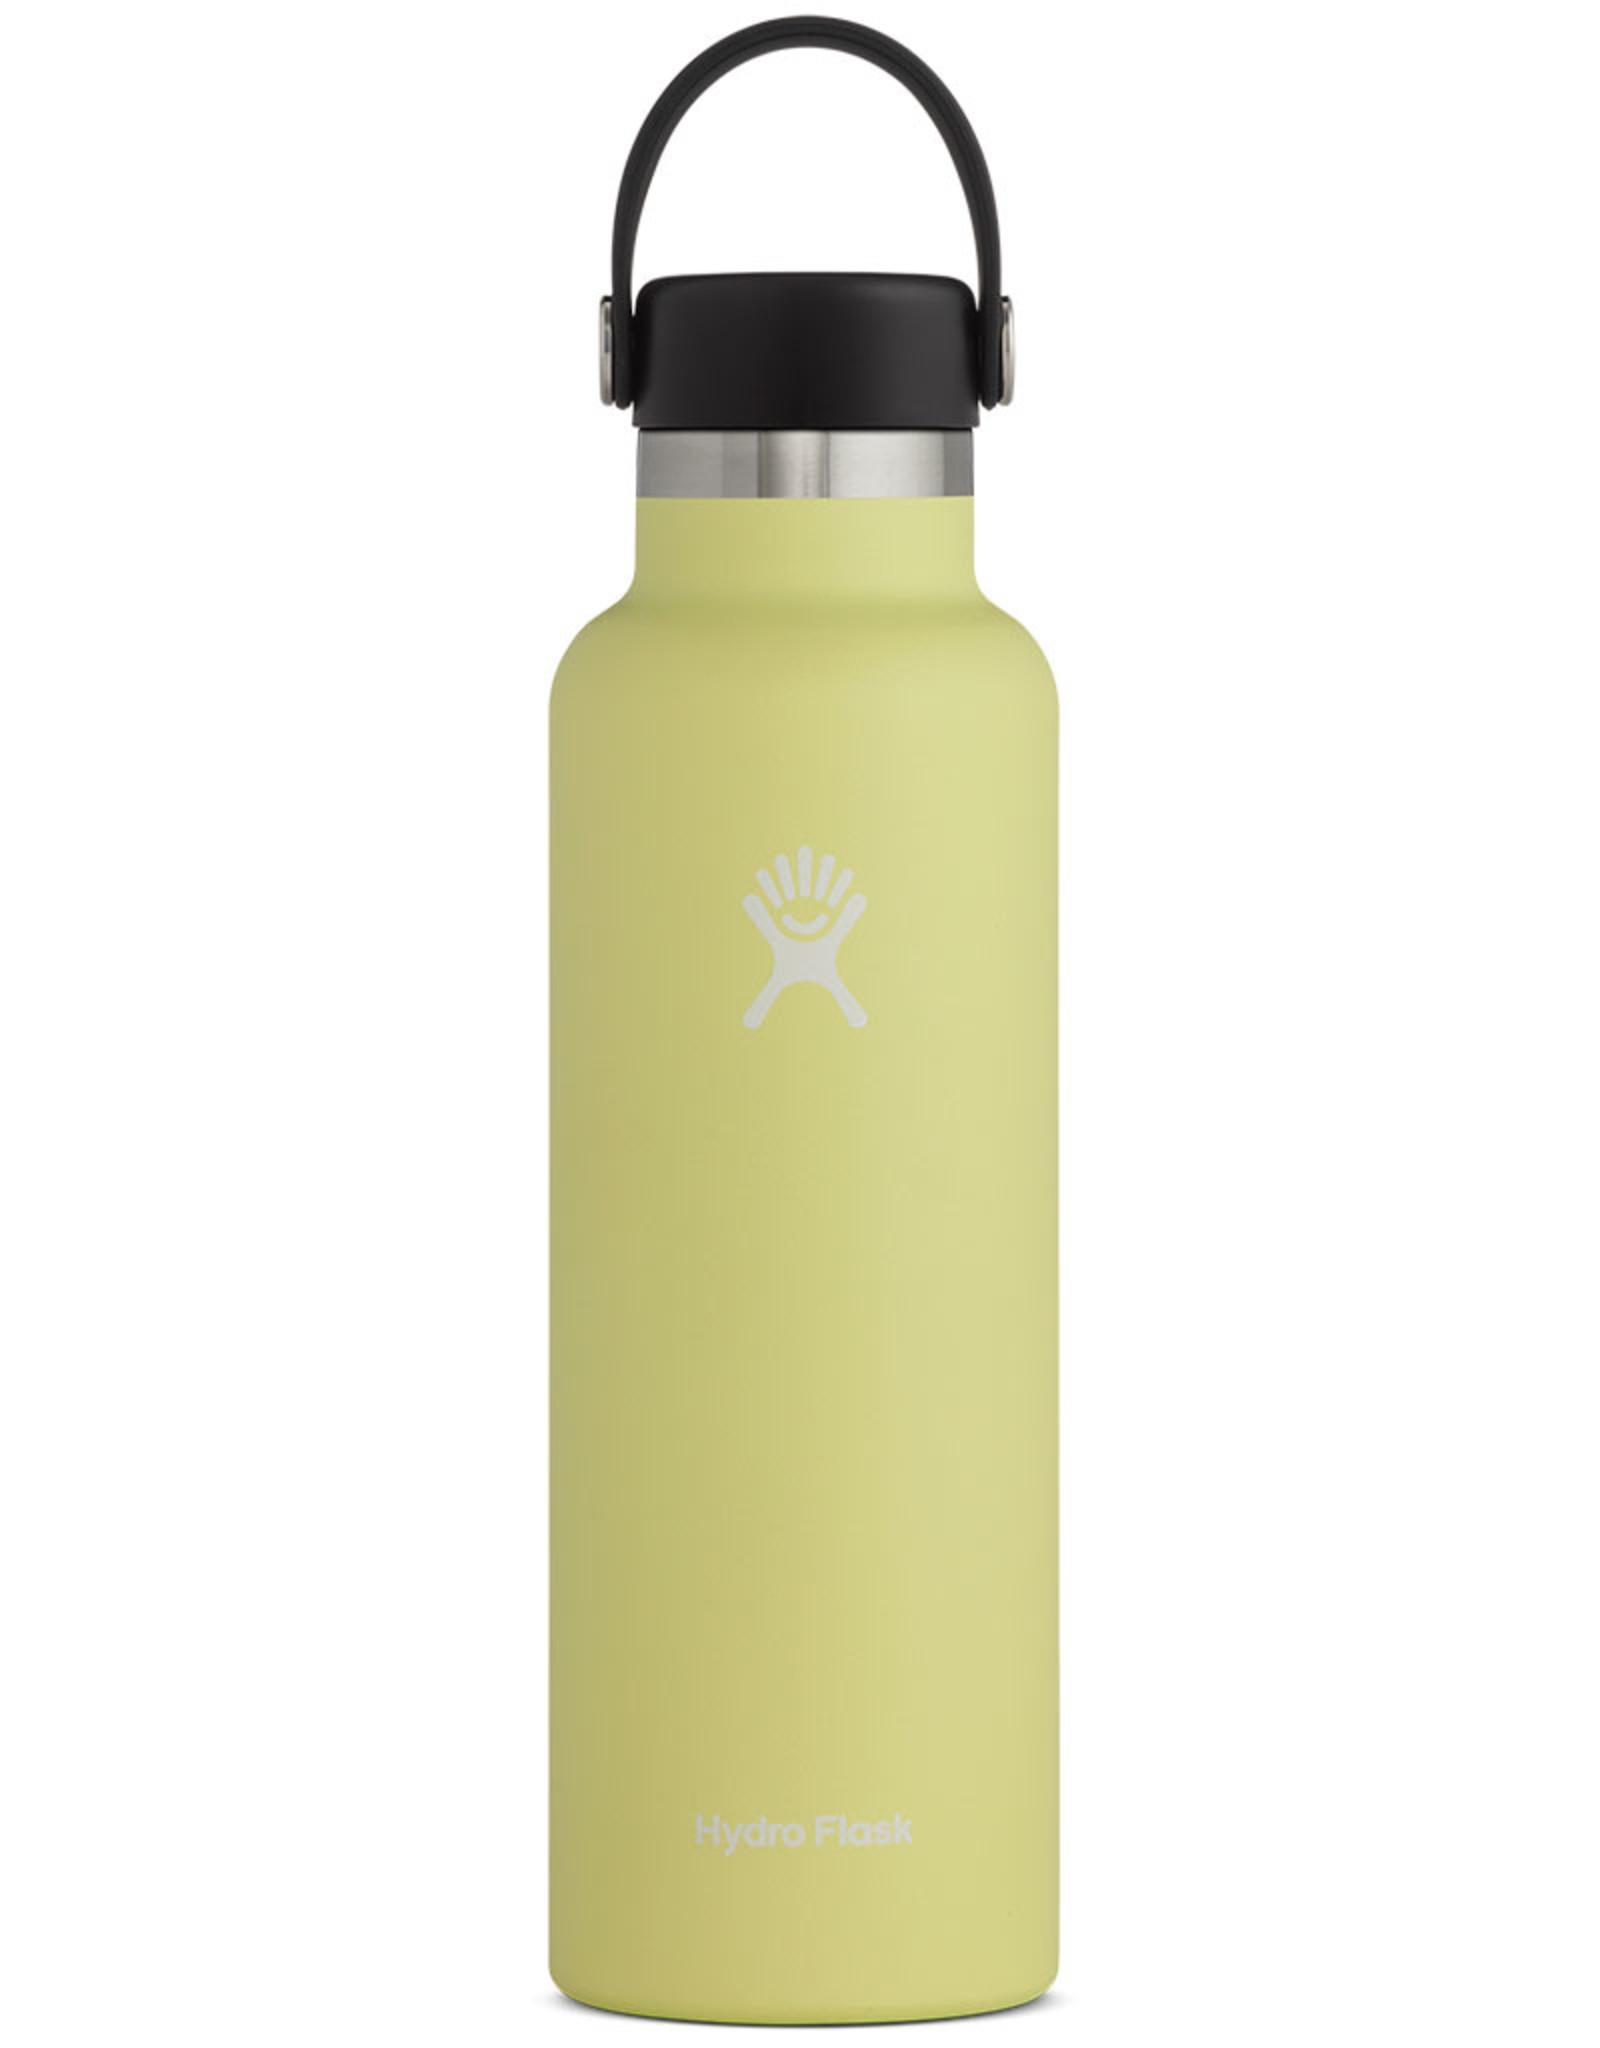 Hydroflask HYDROFLASK 21 OZ STANDARD MOUTH FLEX CAP